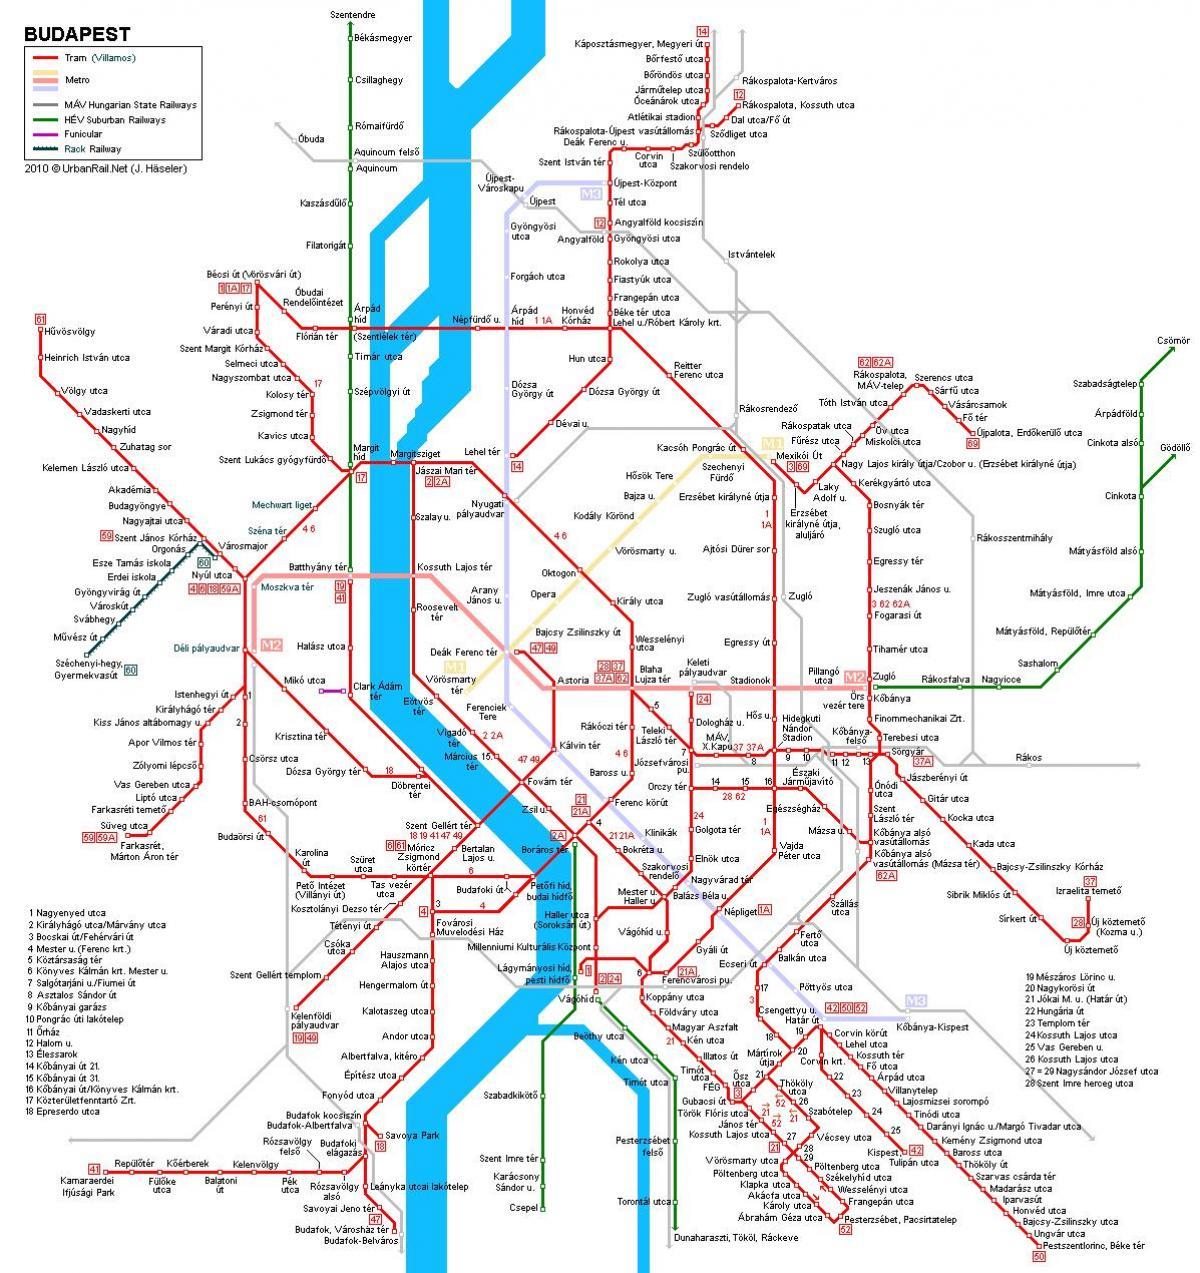 Metra W Budapeszcie Mapa Metra Lotnisko Budapeszt Mapa Metra Wegry